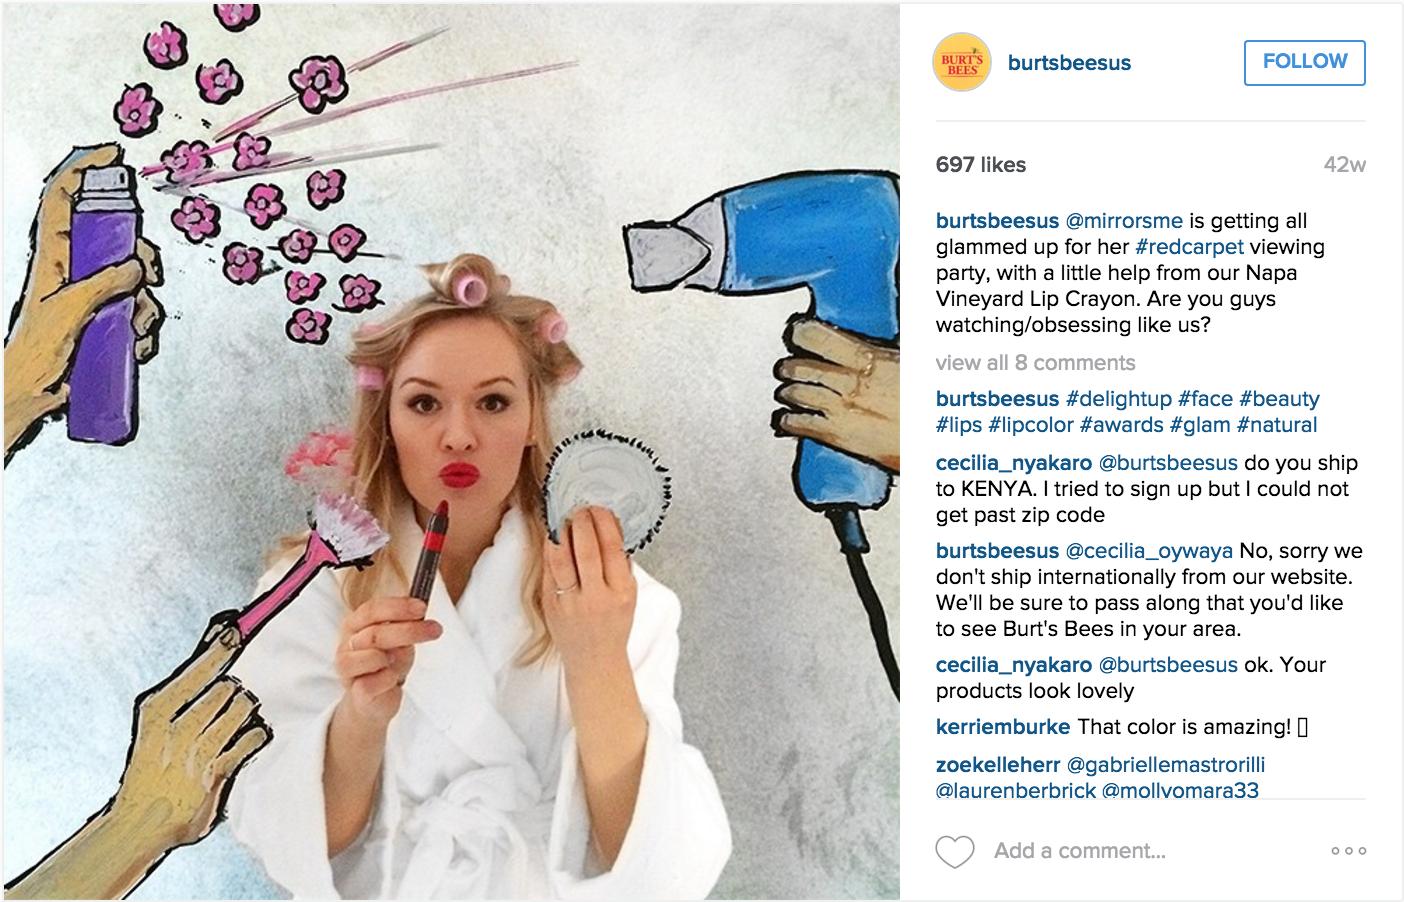 Burtbee's delight instagram campaign